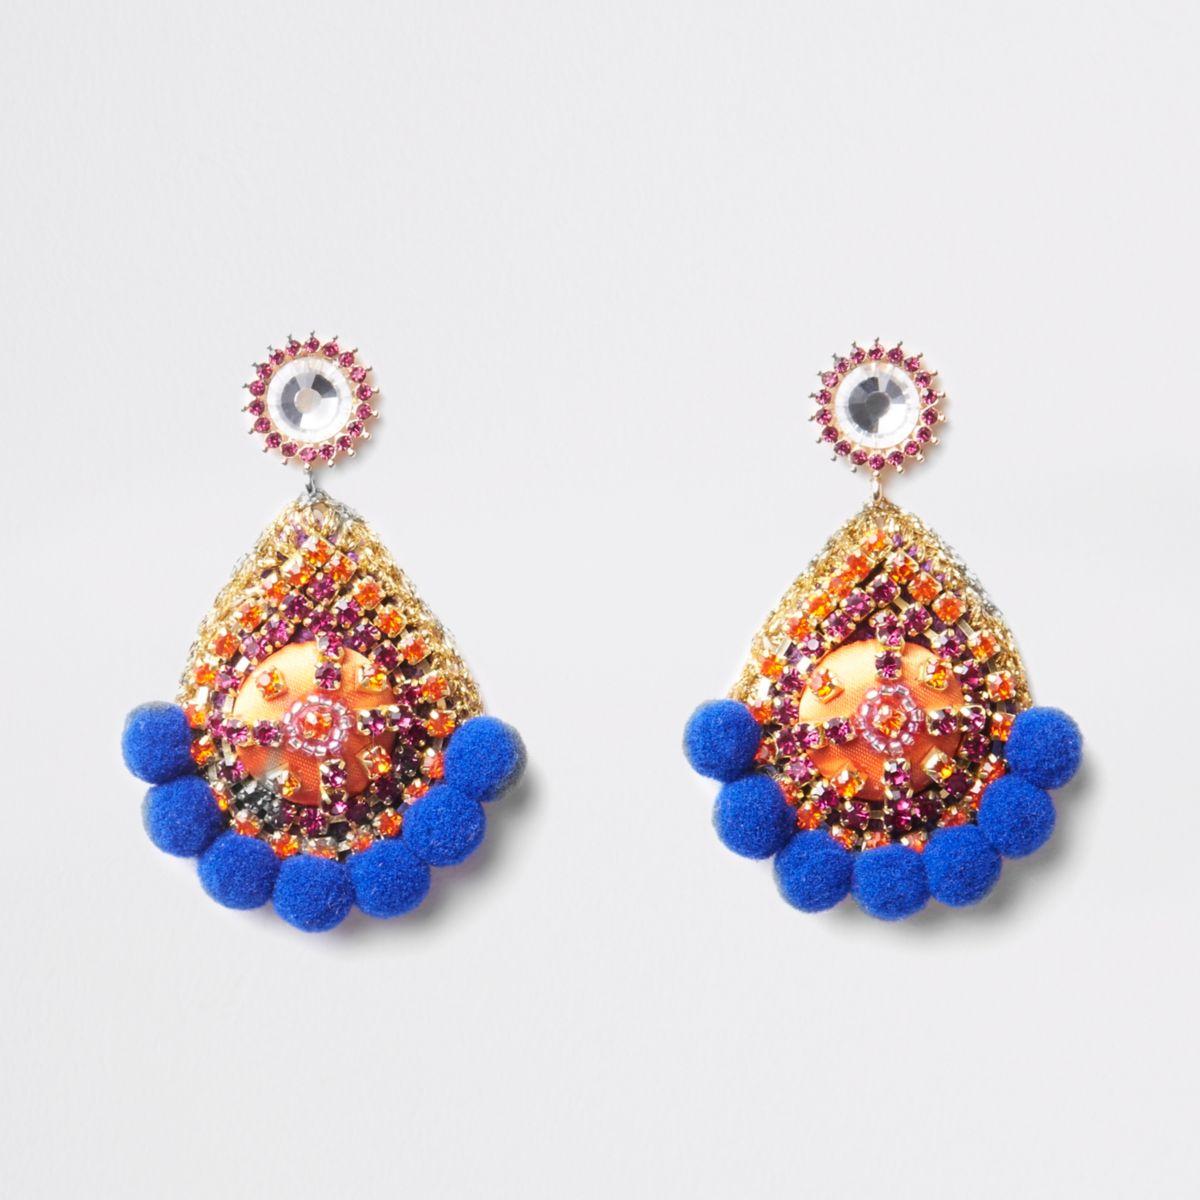 Blue pom pom rhinestone stud earrings